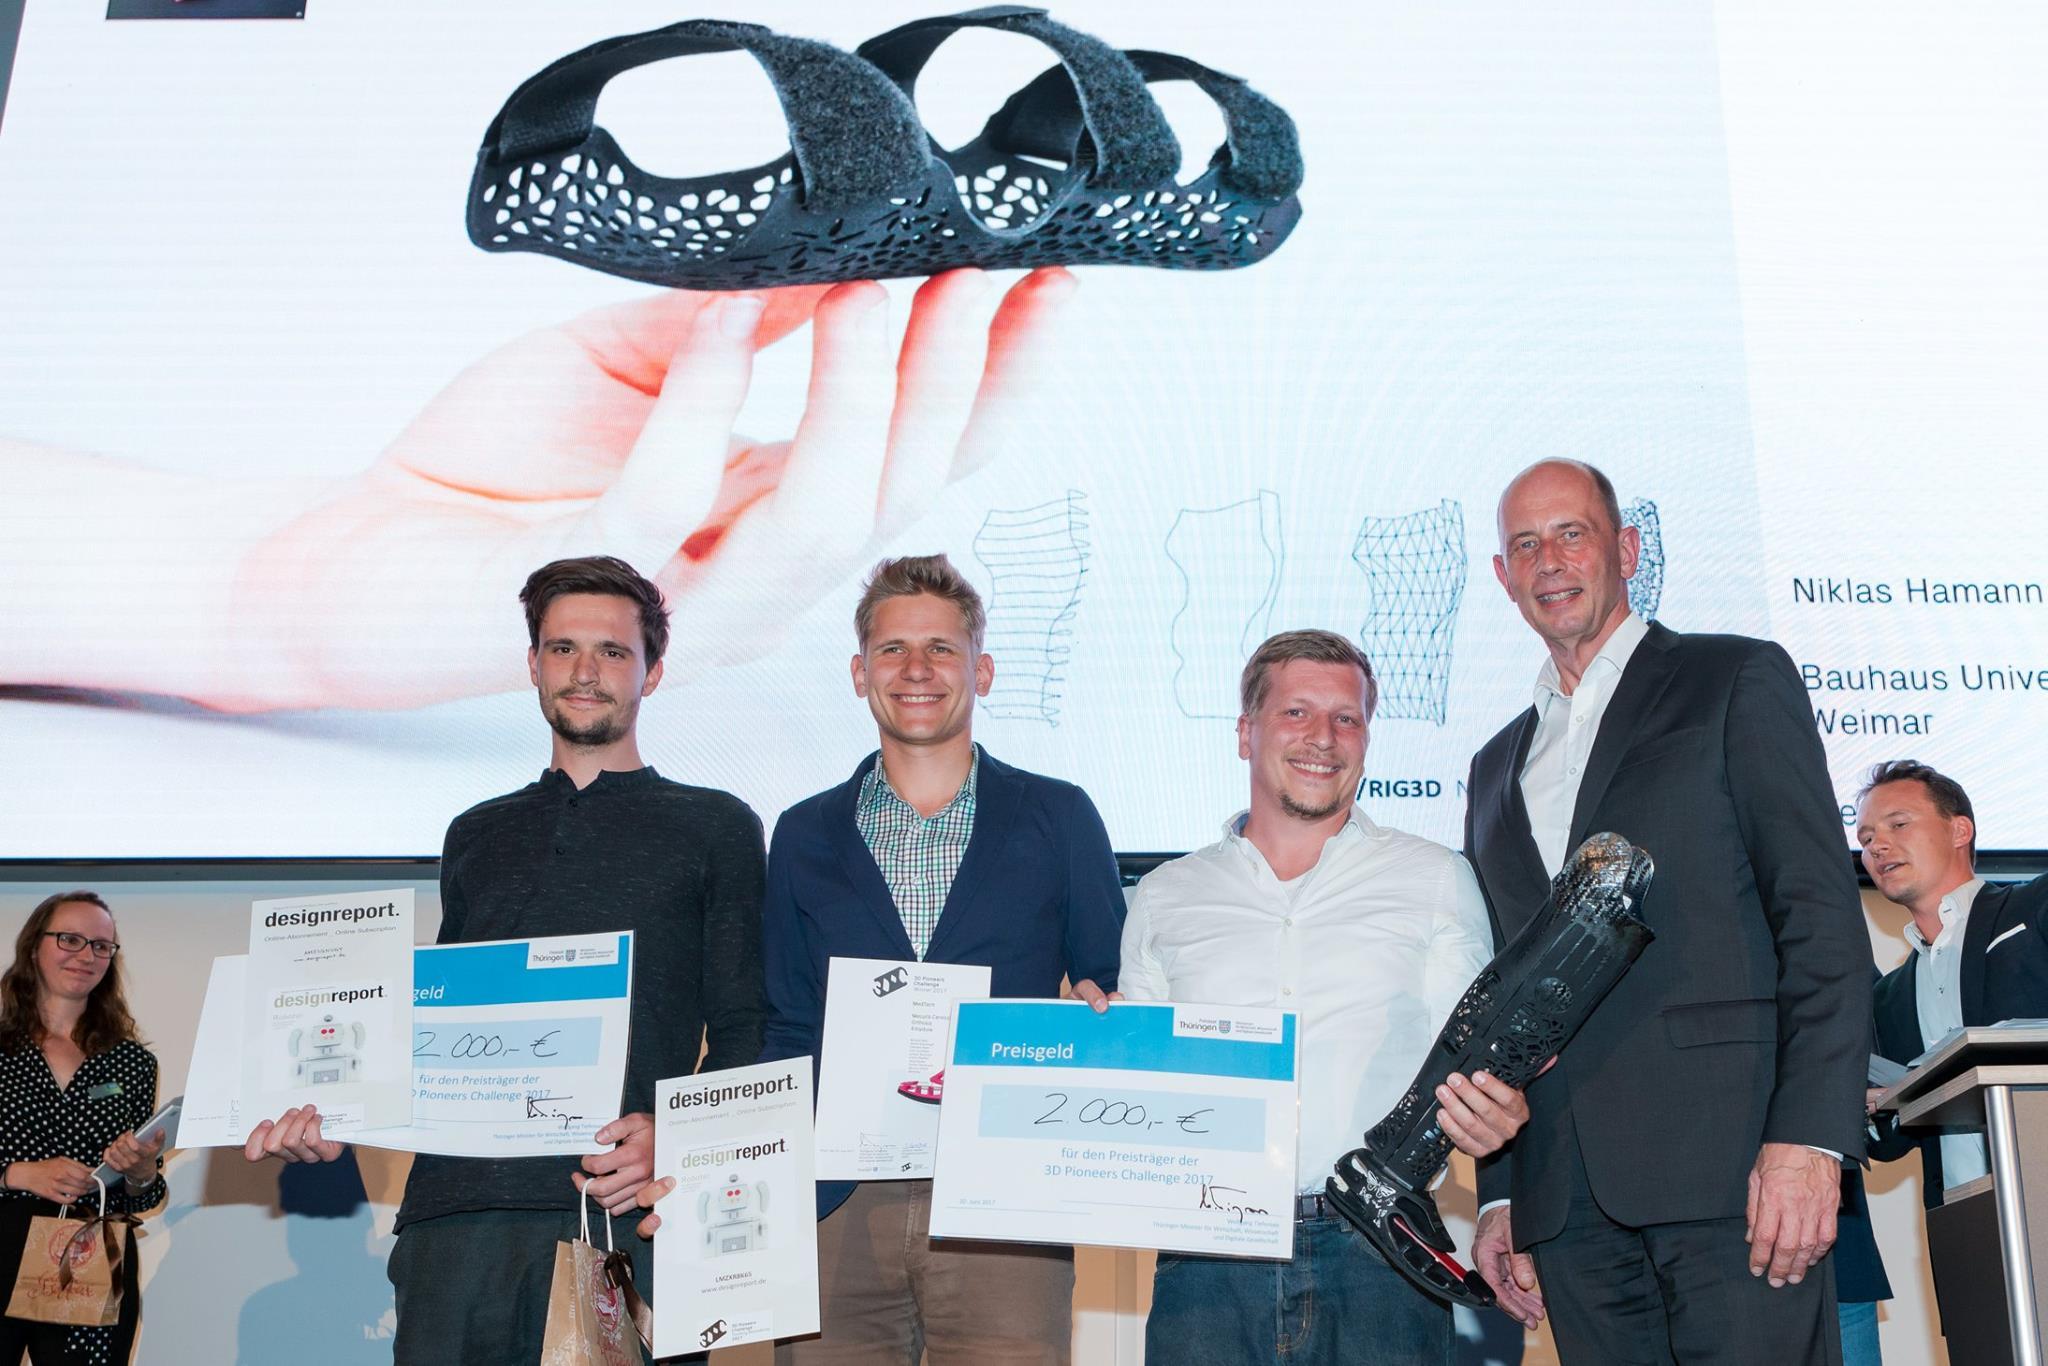 Winners of the MedTech category Mecuris and Niklas Haman. Photo via 3DPC.